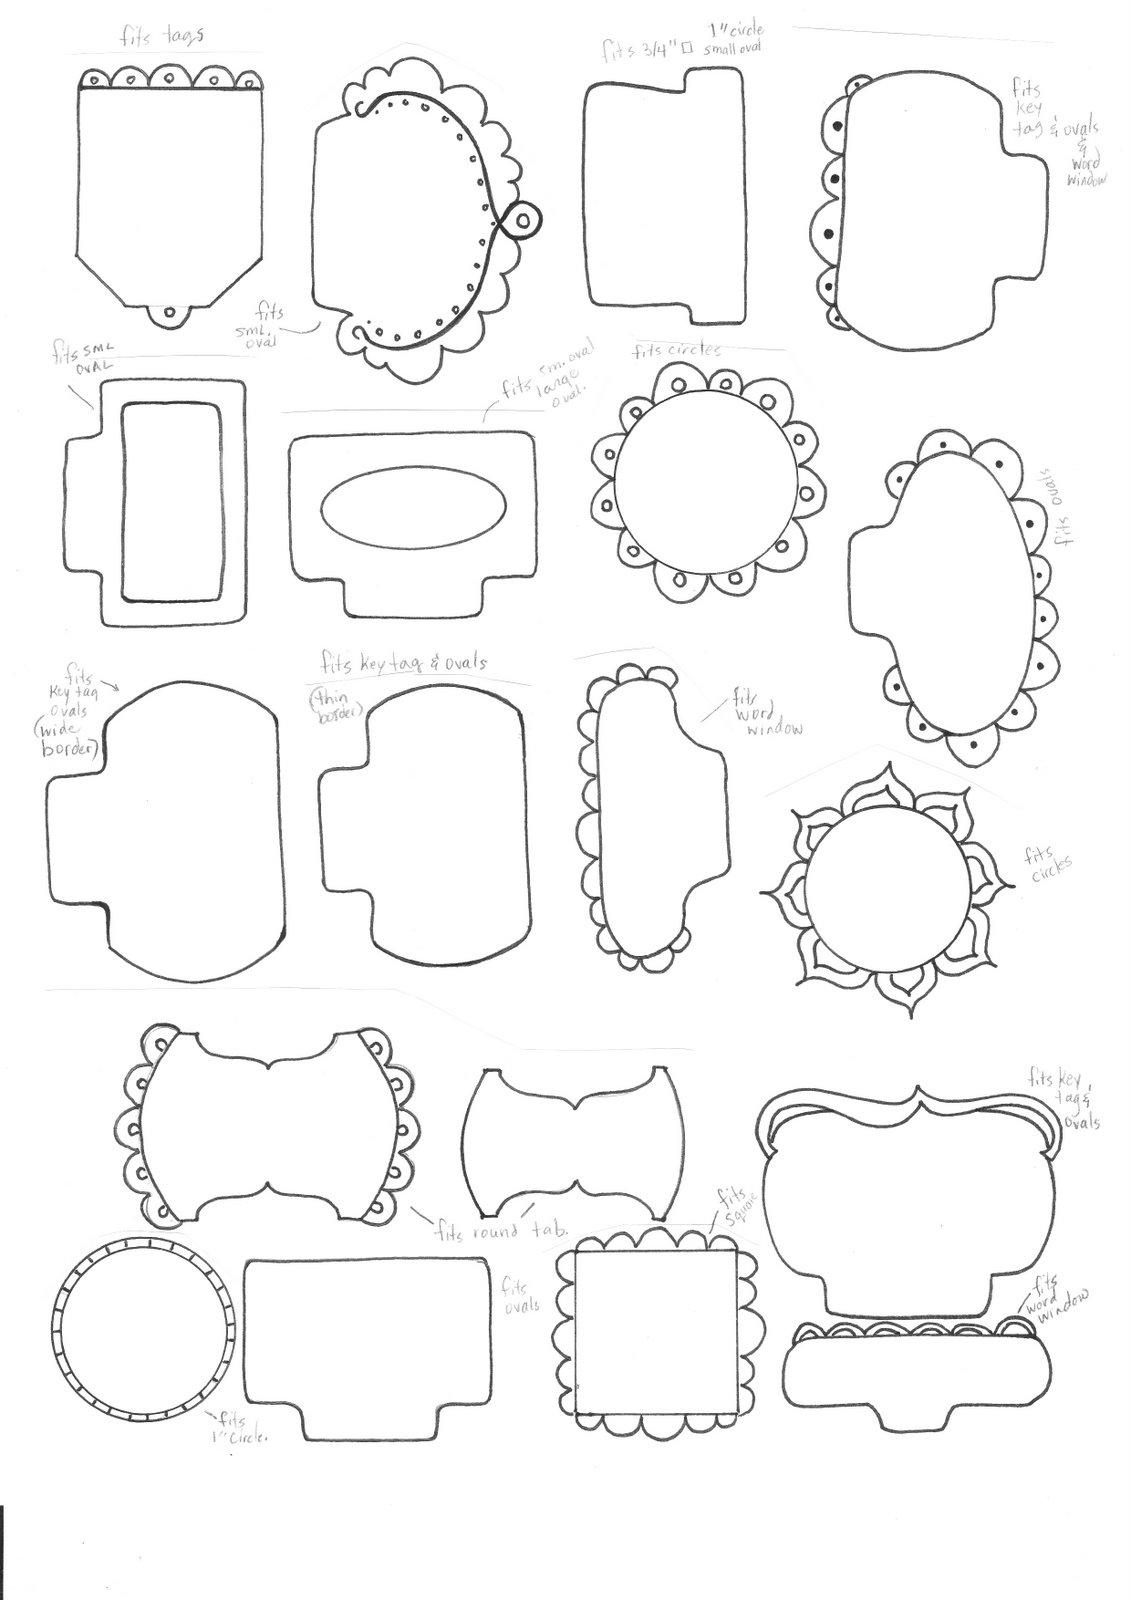 1131x1600 Tab template melstampz.jpg] Patterns Amp Templates